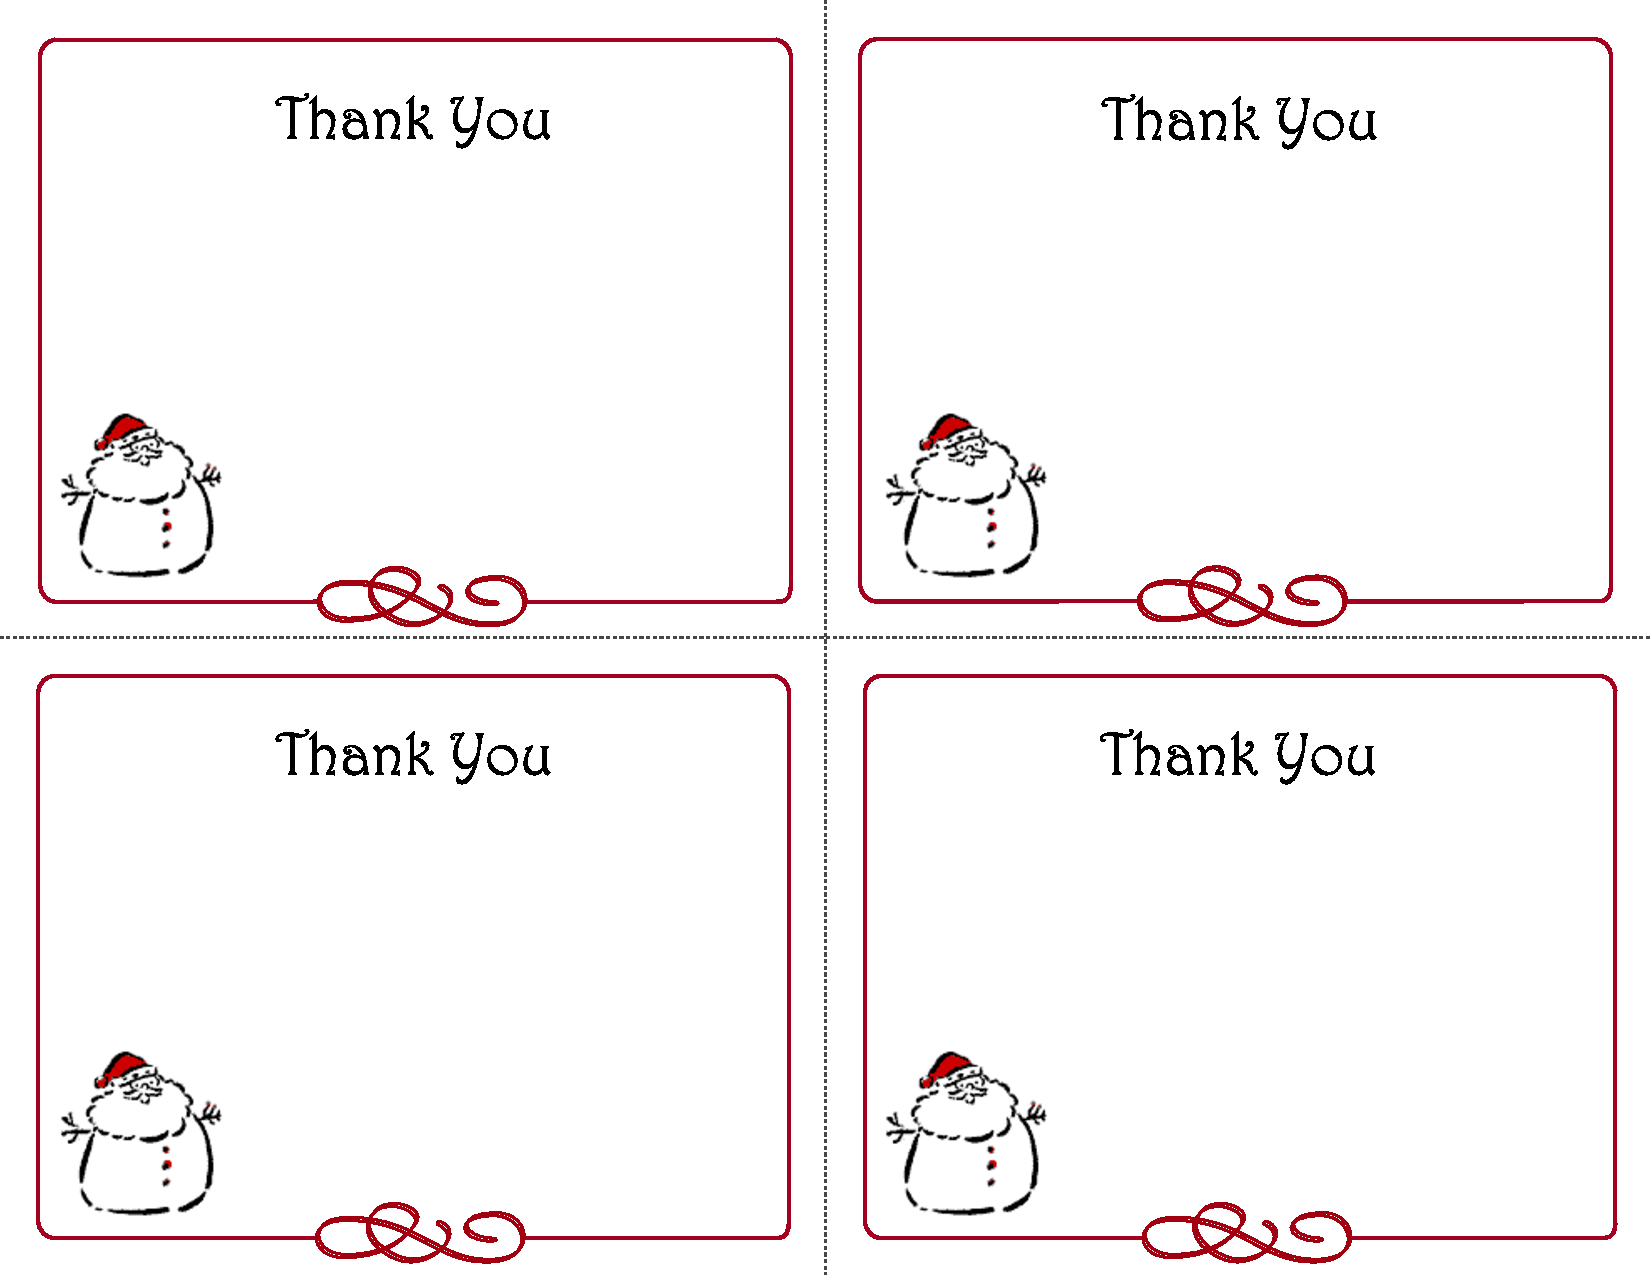 Free Christmas Thank You Notes Printable – Festival Collections - Free Christmas Thank You Notes Printable